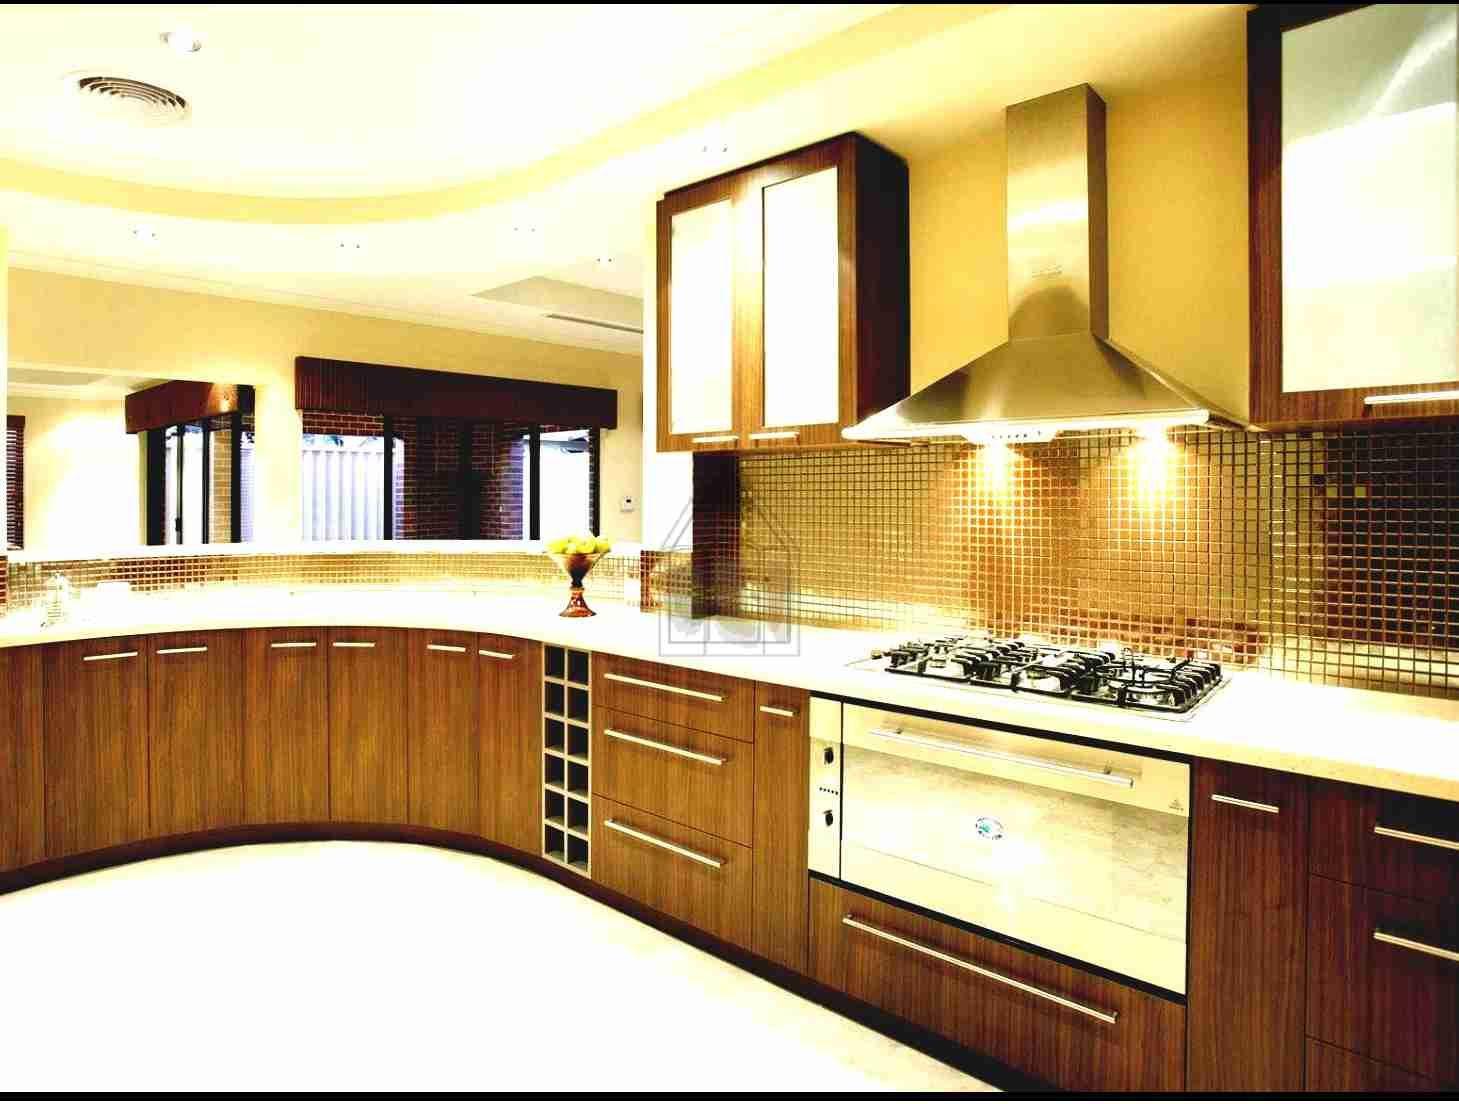 Kitchen Design Karachi kitchenette design karachi pakistan | kitchen interior designs